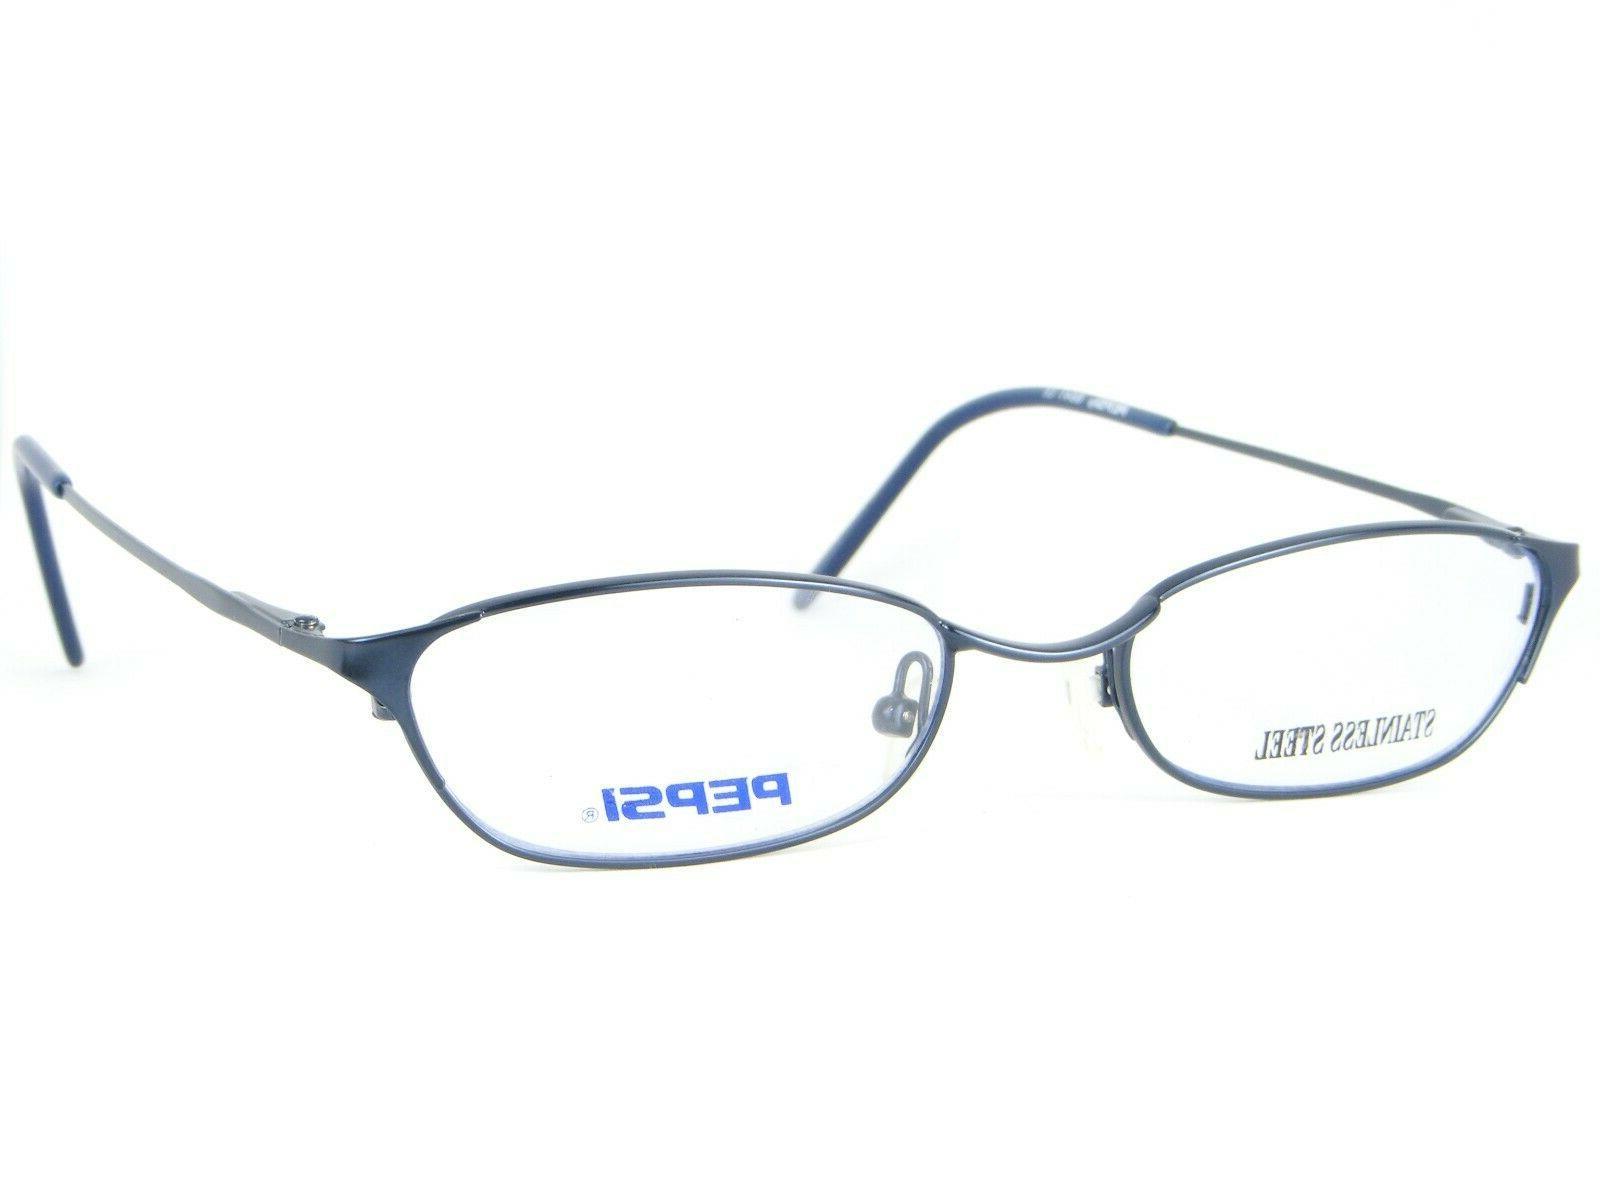 new 6641 bl blue eyeglasses glasses metal